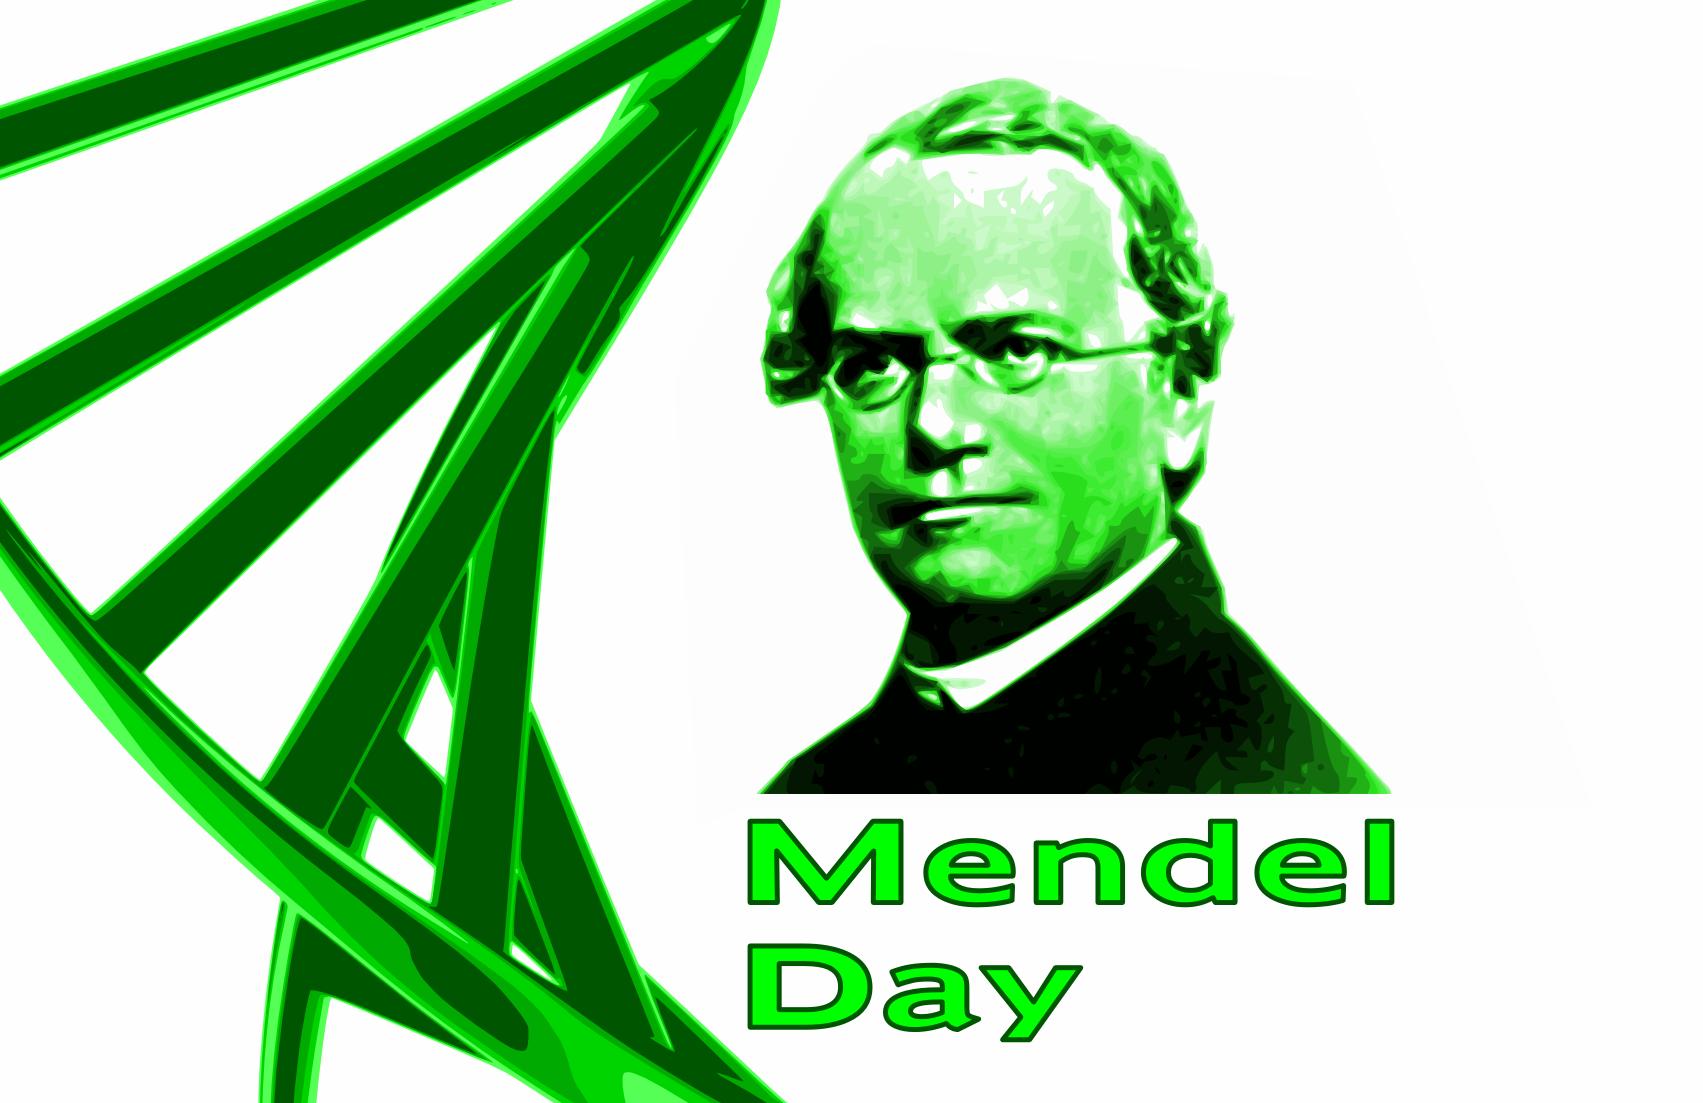 I Mendel day 2015